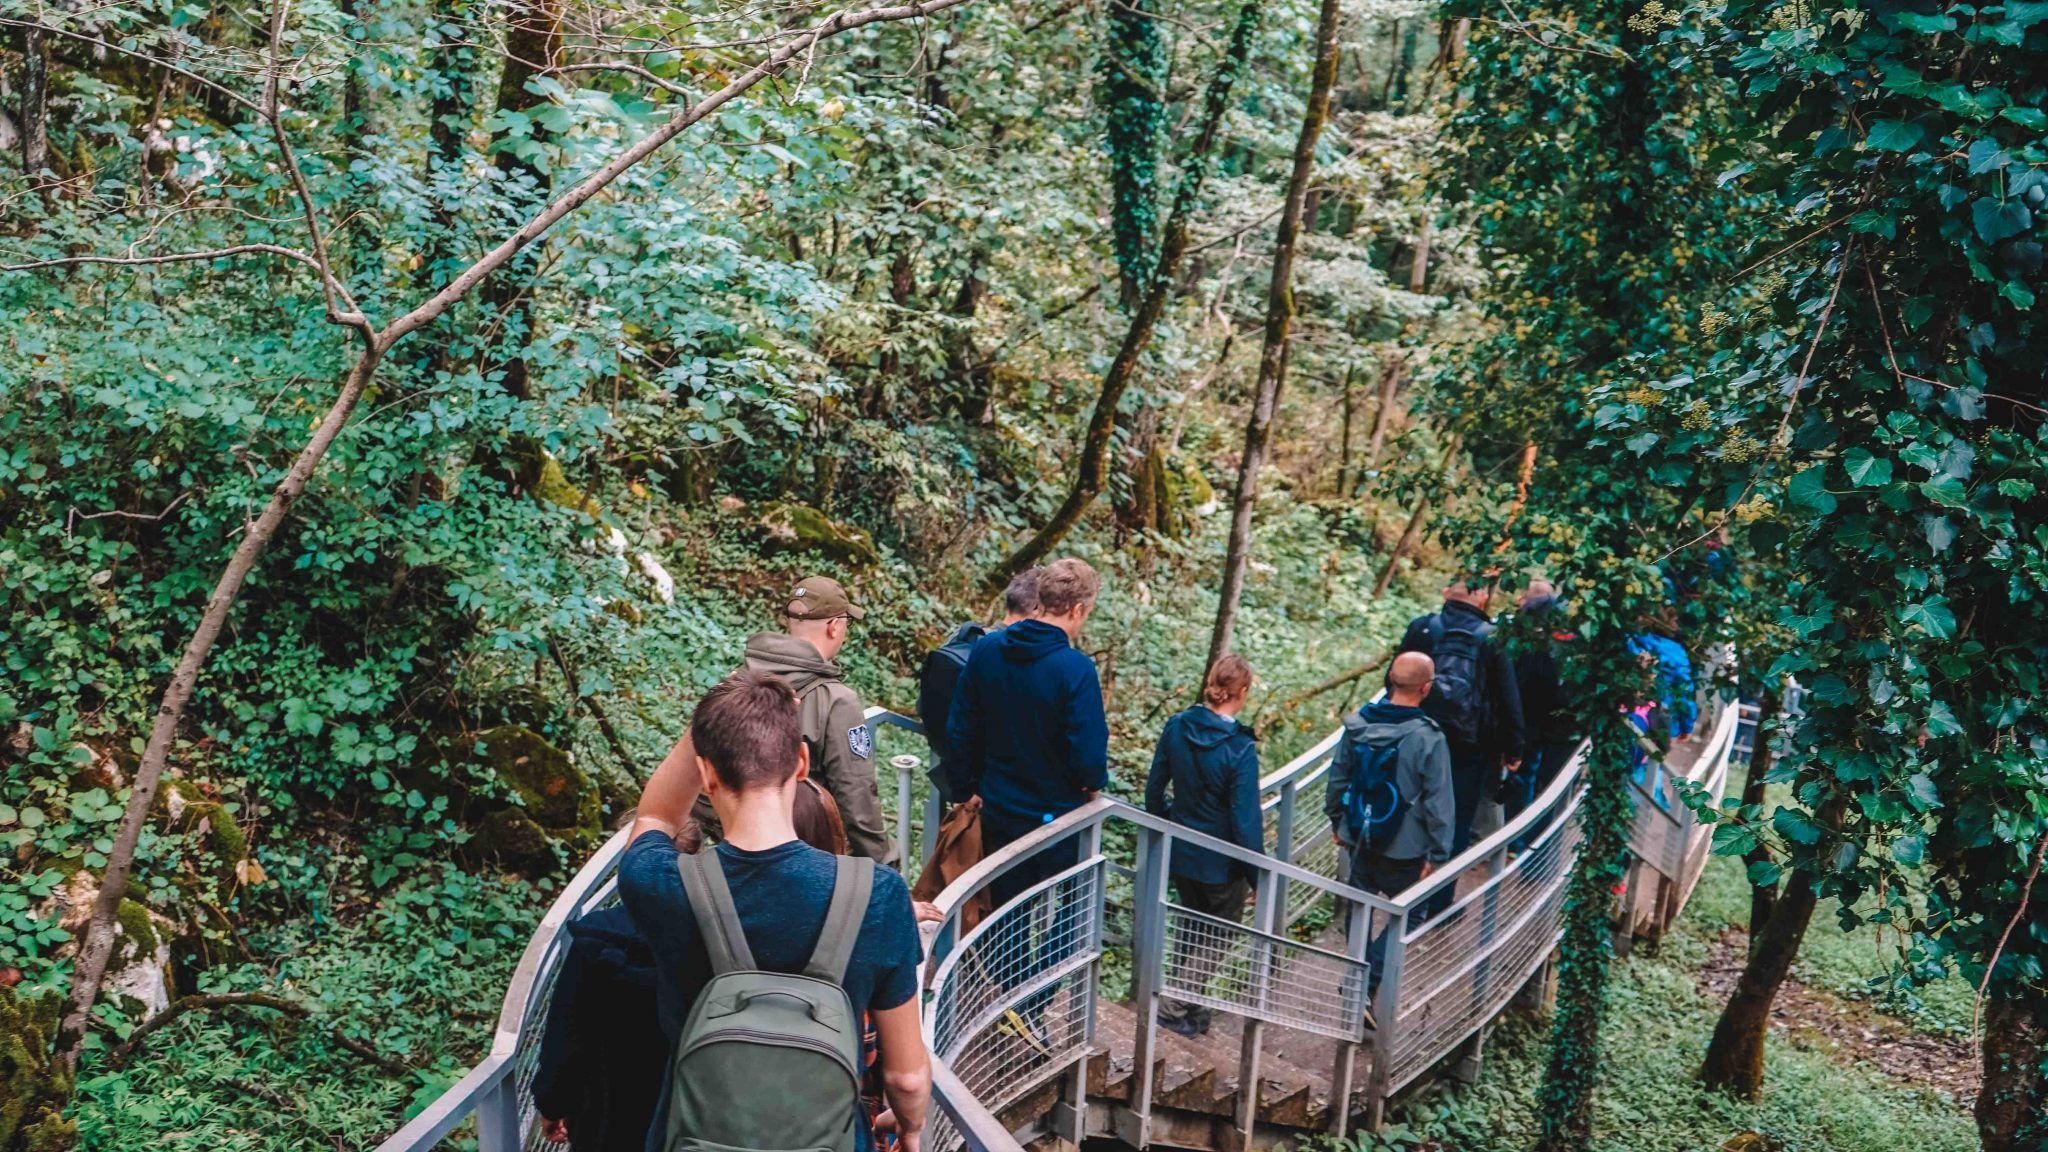 Prometheus Cave trail